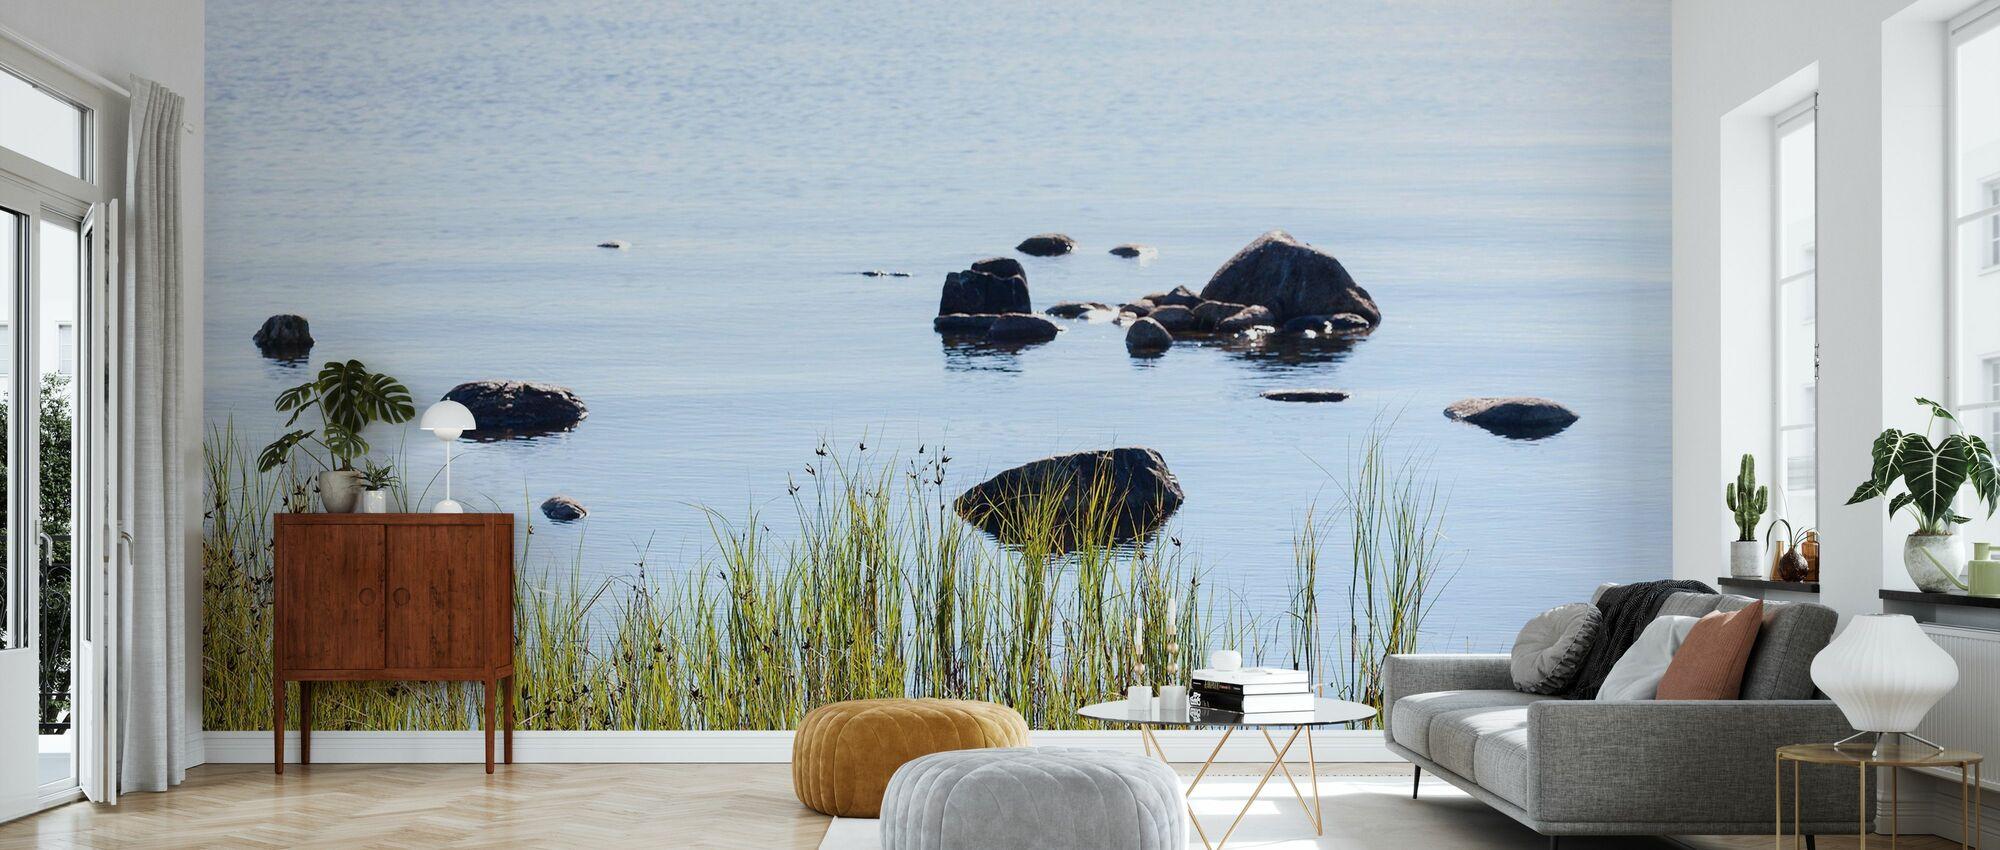 Stenar i Vatten, Gotland - Tapet - Vardagsrum